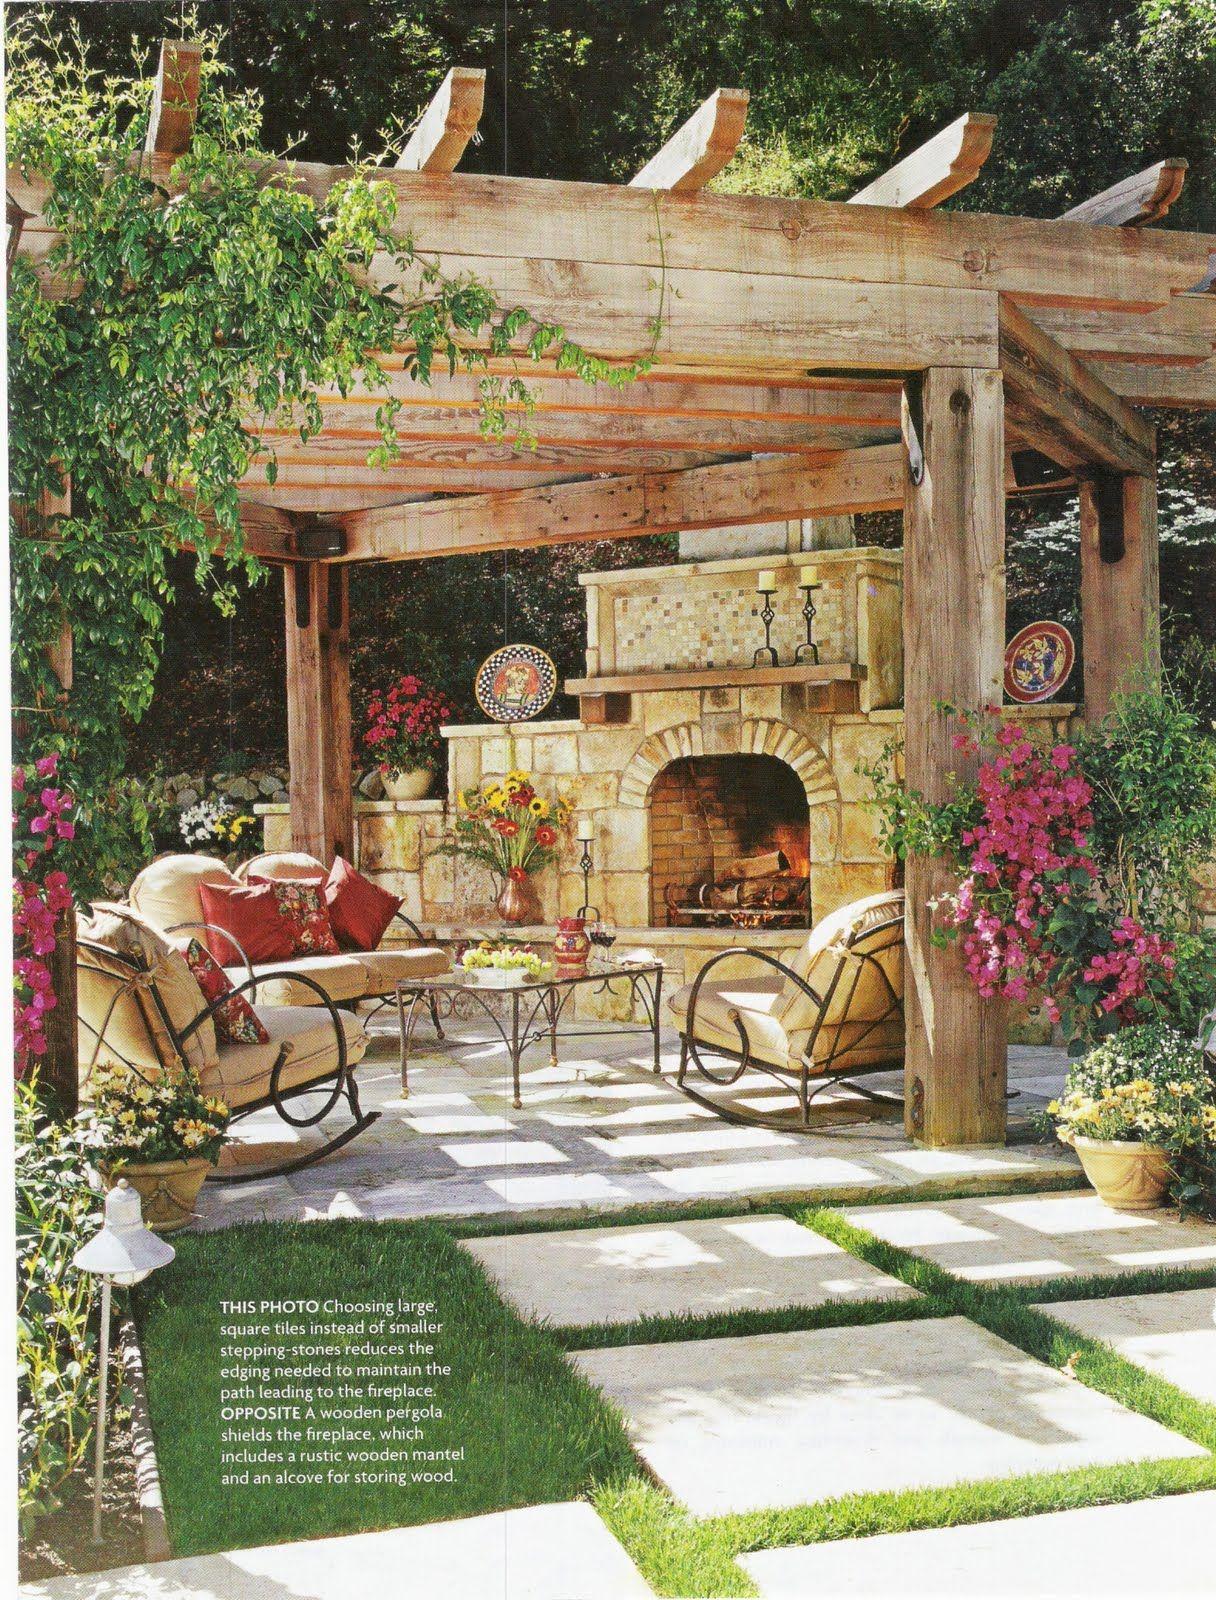 Outdoor Covered Patio With Fireplace Great Addition Idea Dream Dream Dream: Backyard Pergola, Backyard, Patio